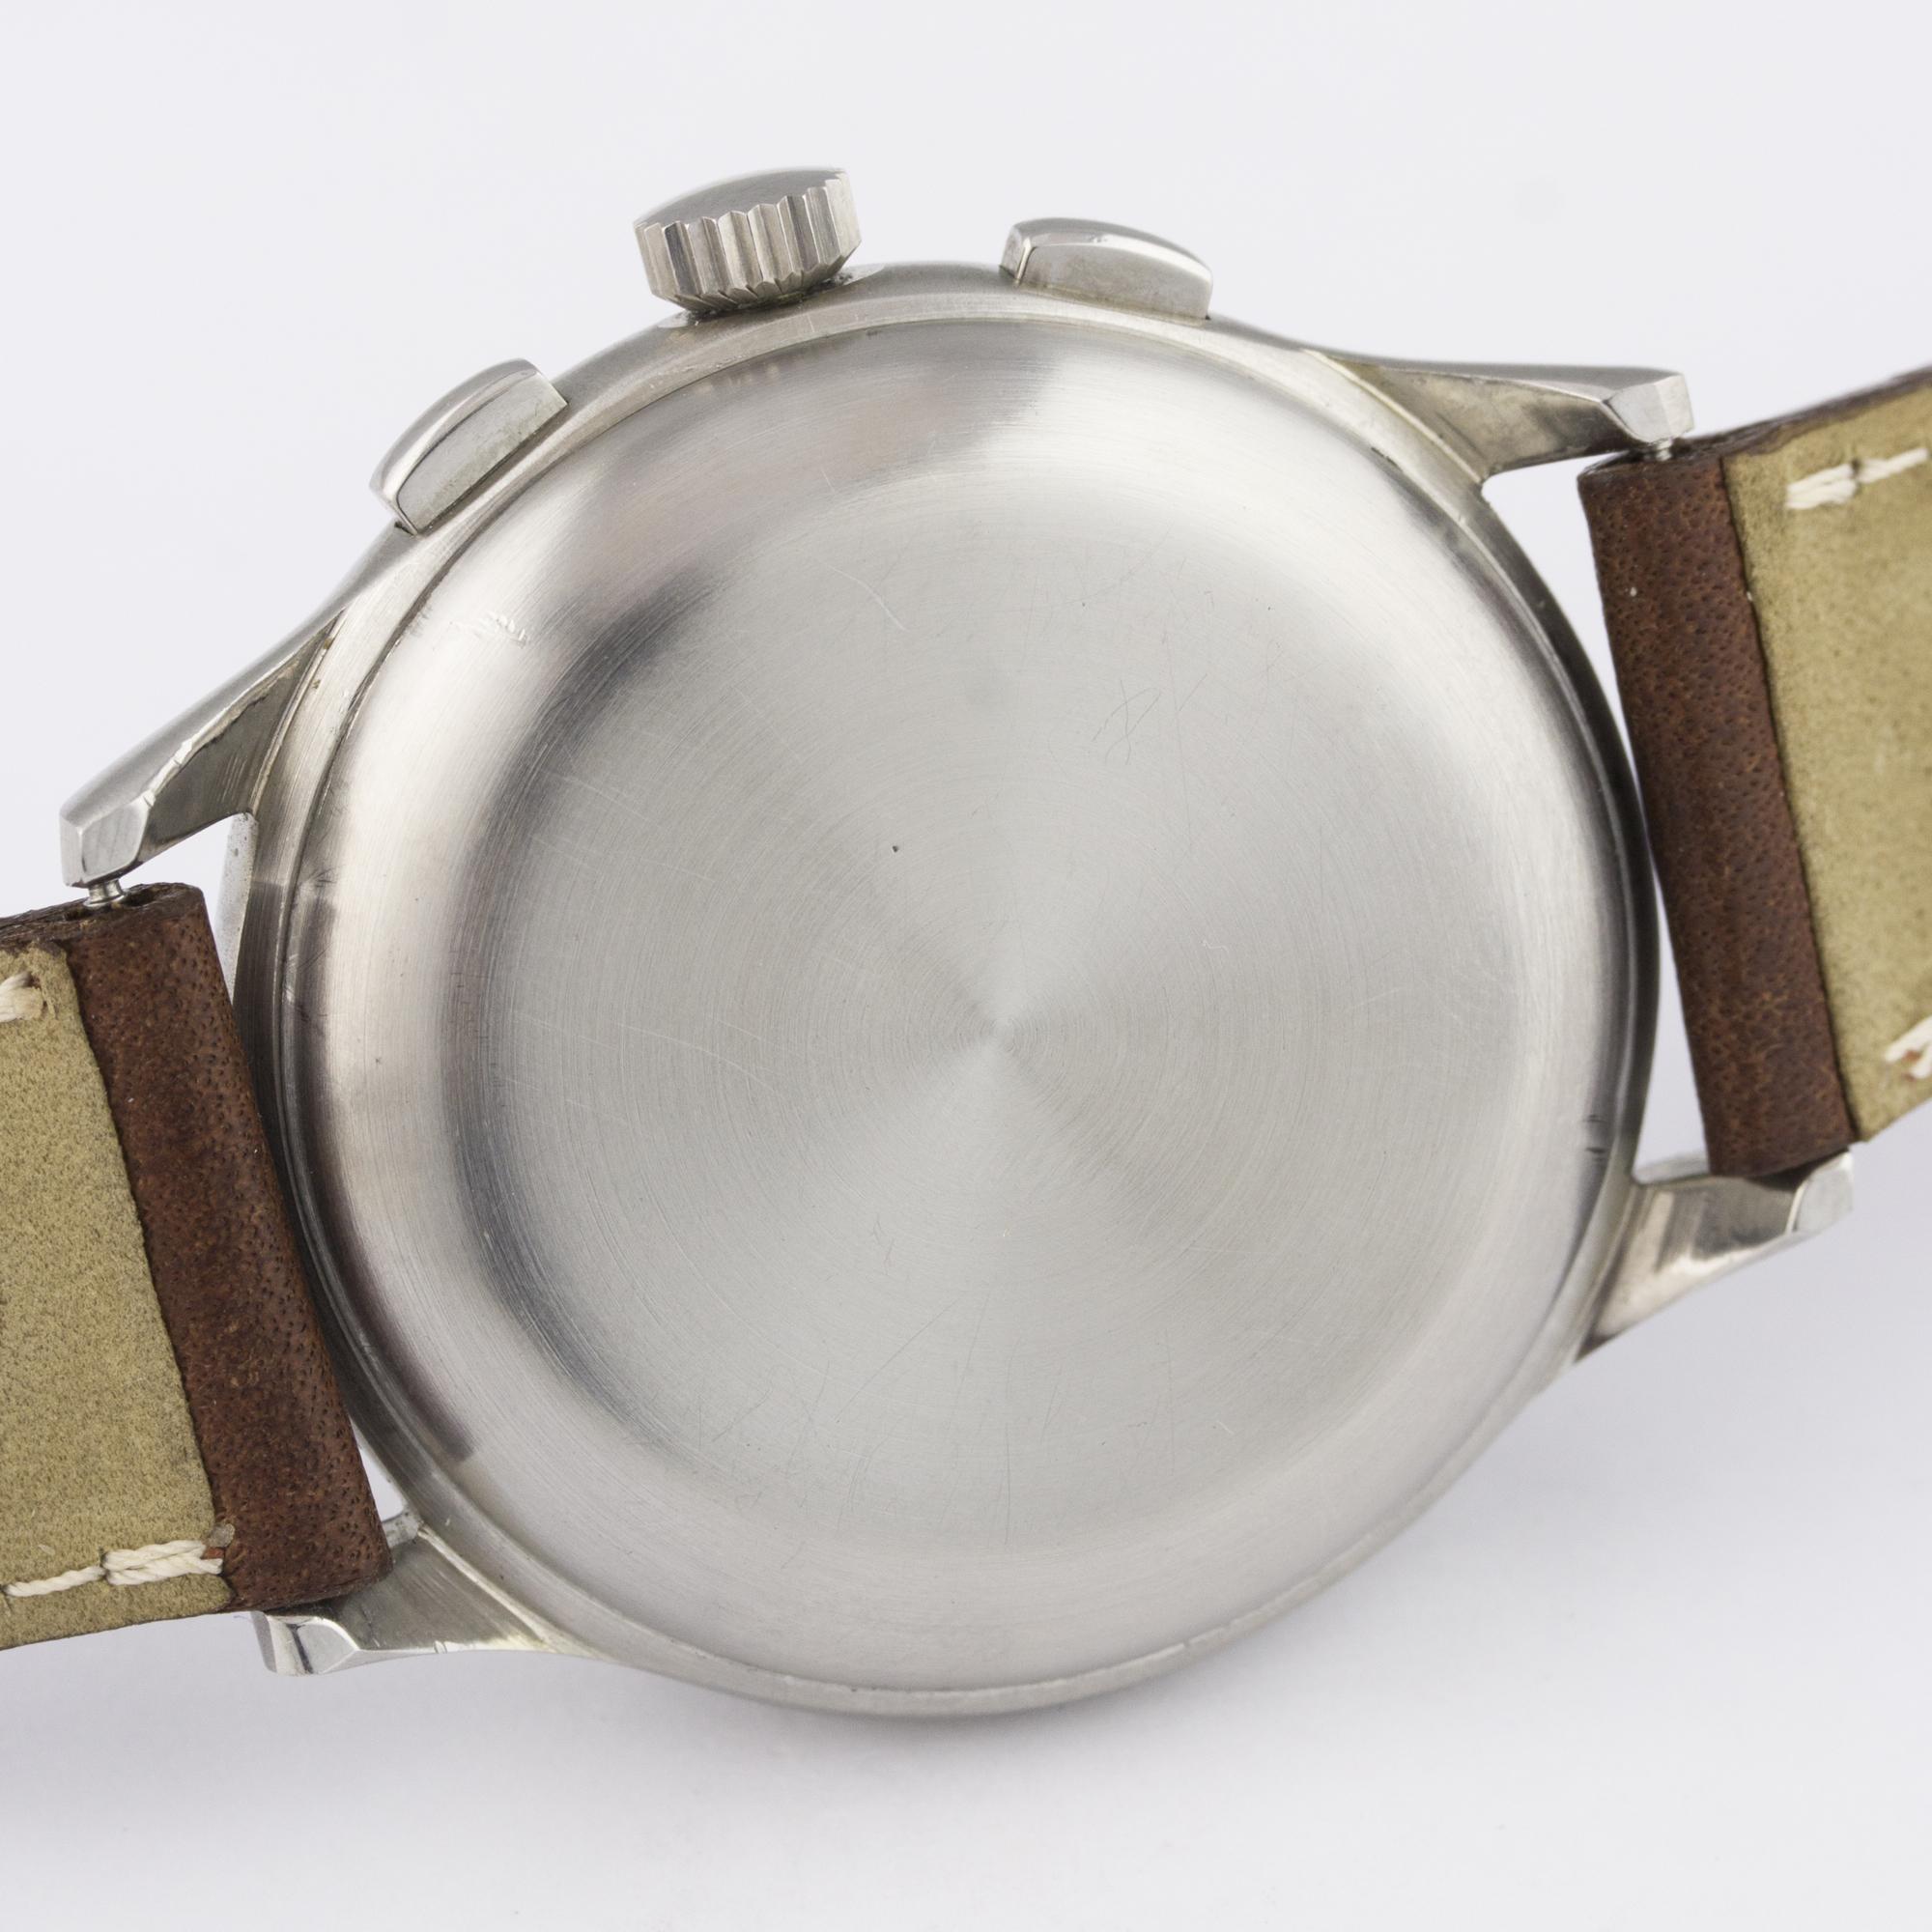 Lot 56 - A RARE GENTLEMAN'S STAINLESS STEEL MINERVA DECIMAL CHRONOGRAPH WRIST WATCH CIRCA 1950s D: Silver